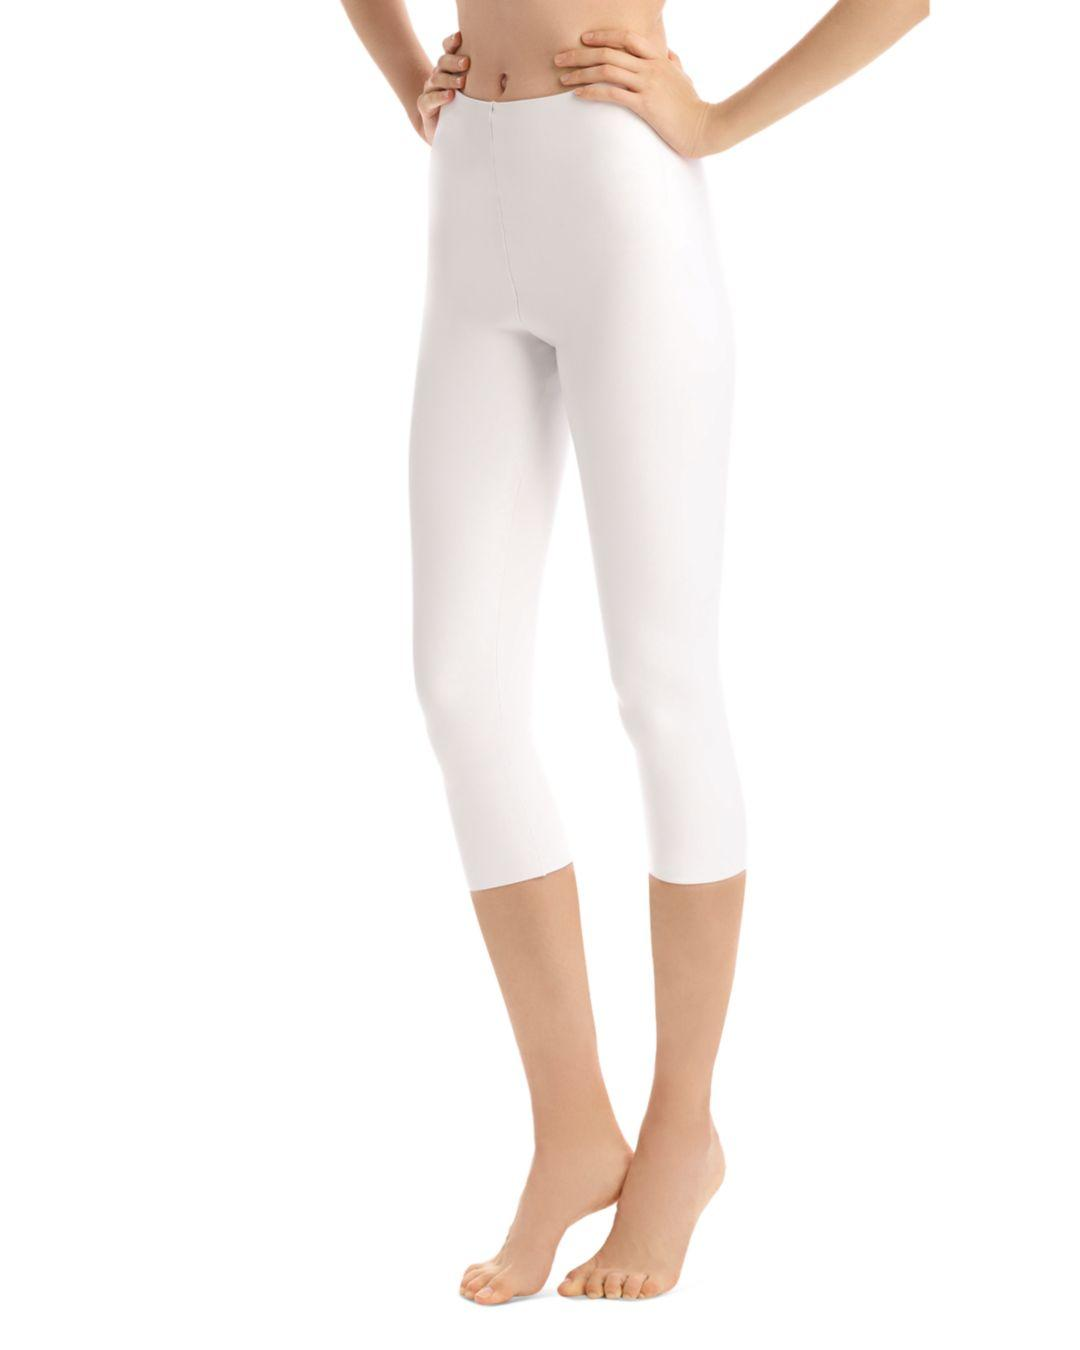 16c636969991be Lyst - Commando Perfect Control Faux Leather Capri Leggings in White